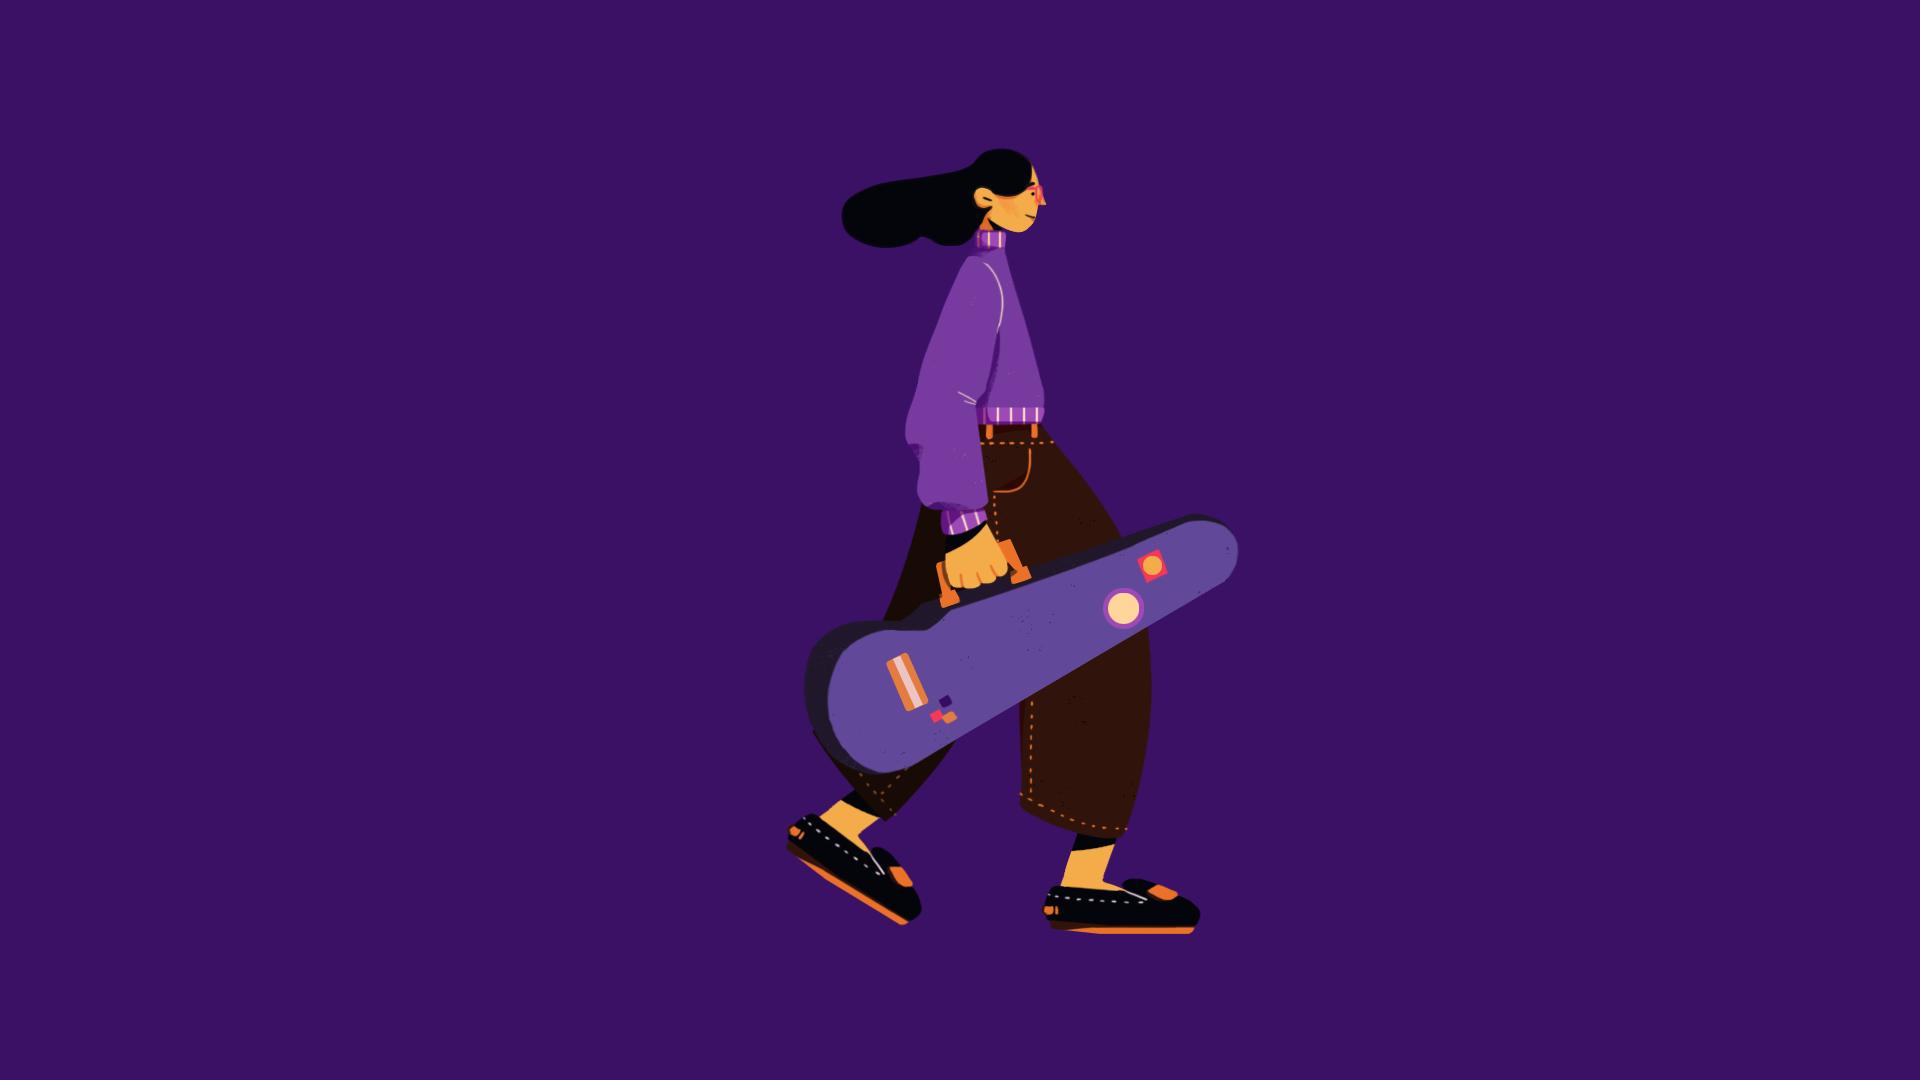 walking-gals-violin-02.png